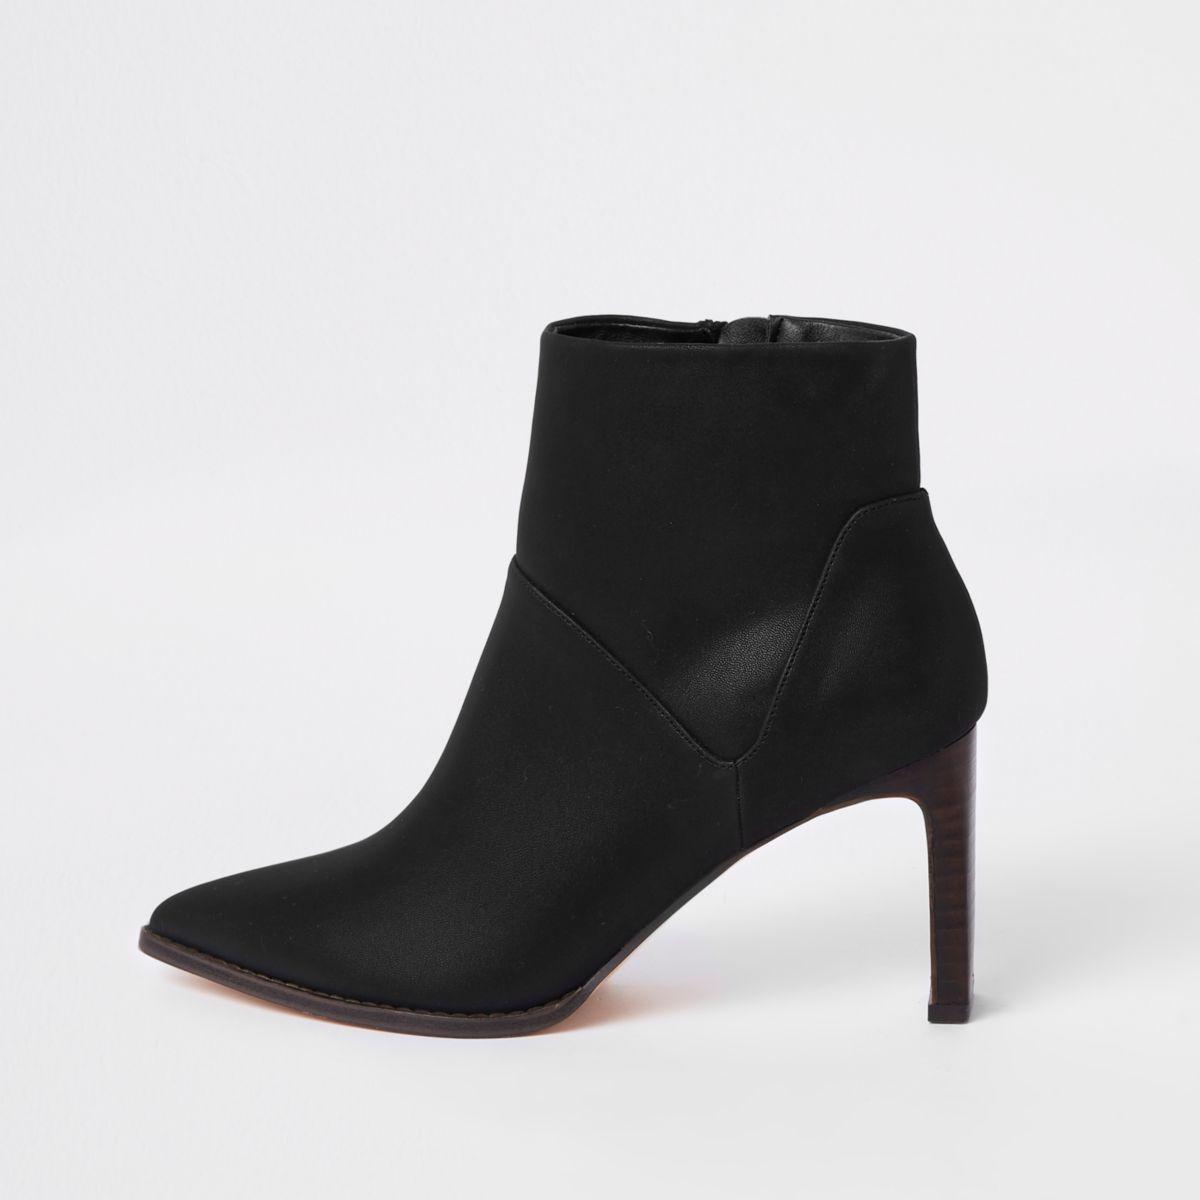 Schwarze, spitze Stiefel